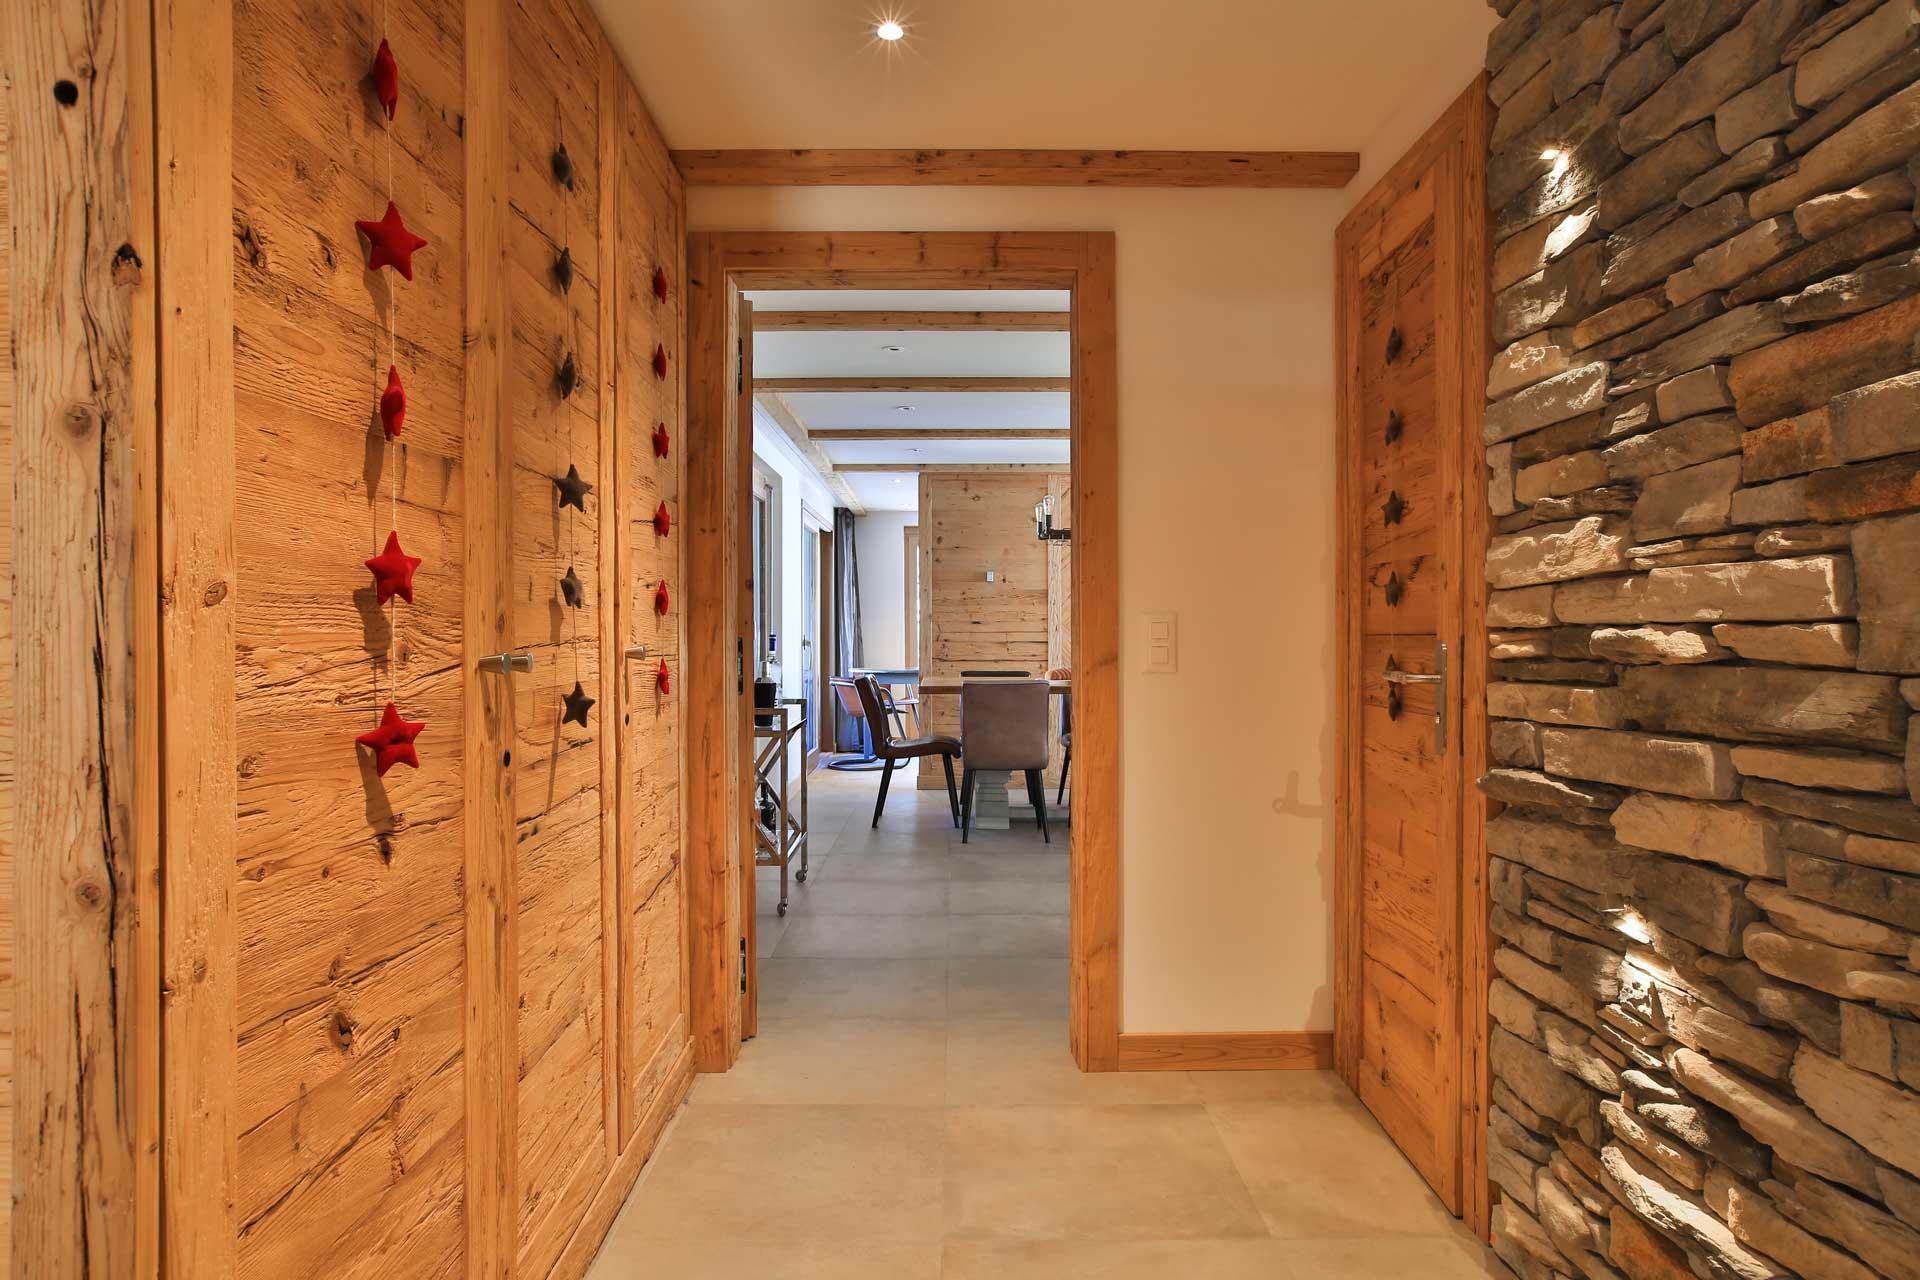 Luxus Appartement Chalet Khione Saas-Fee - Eingang